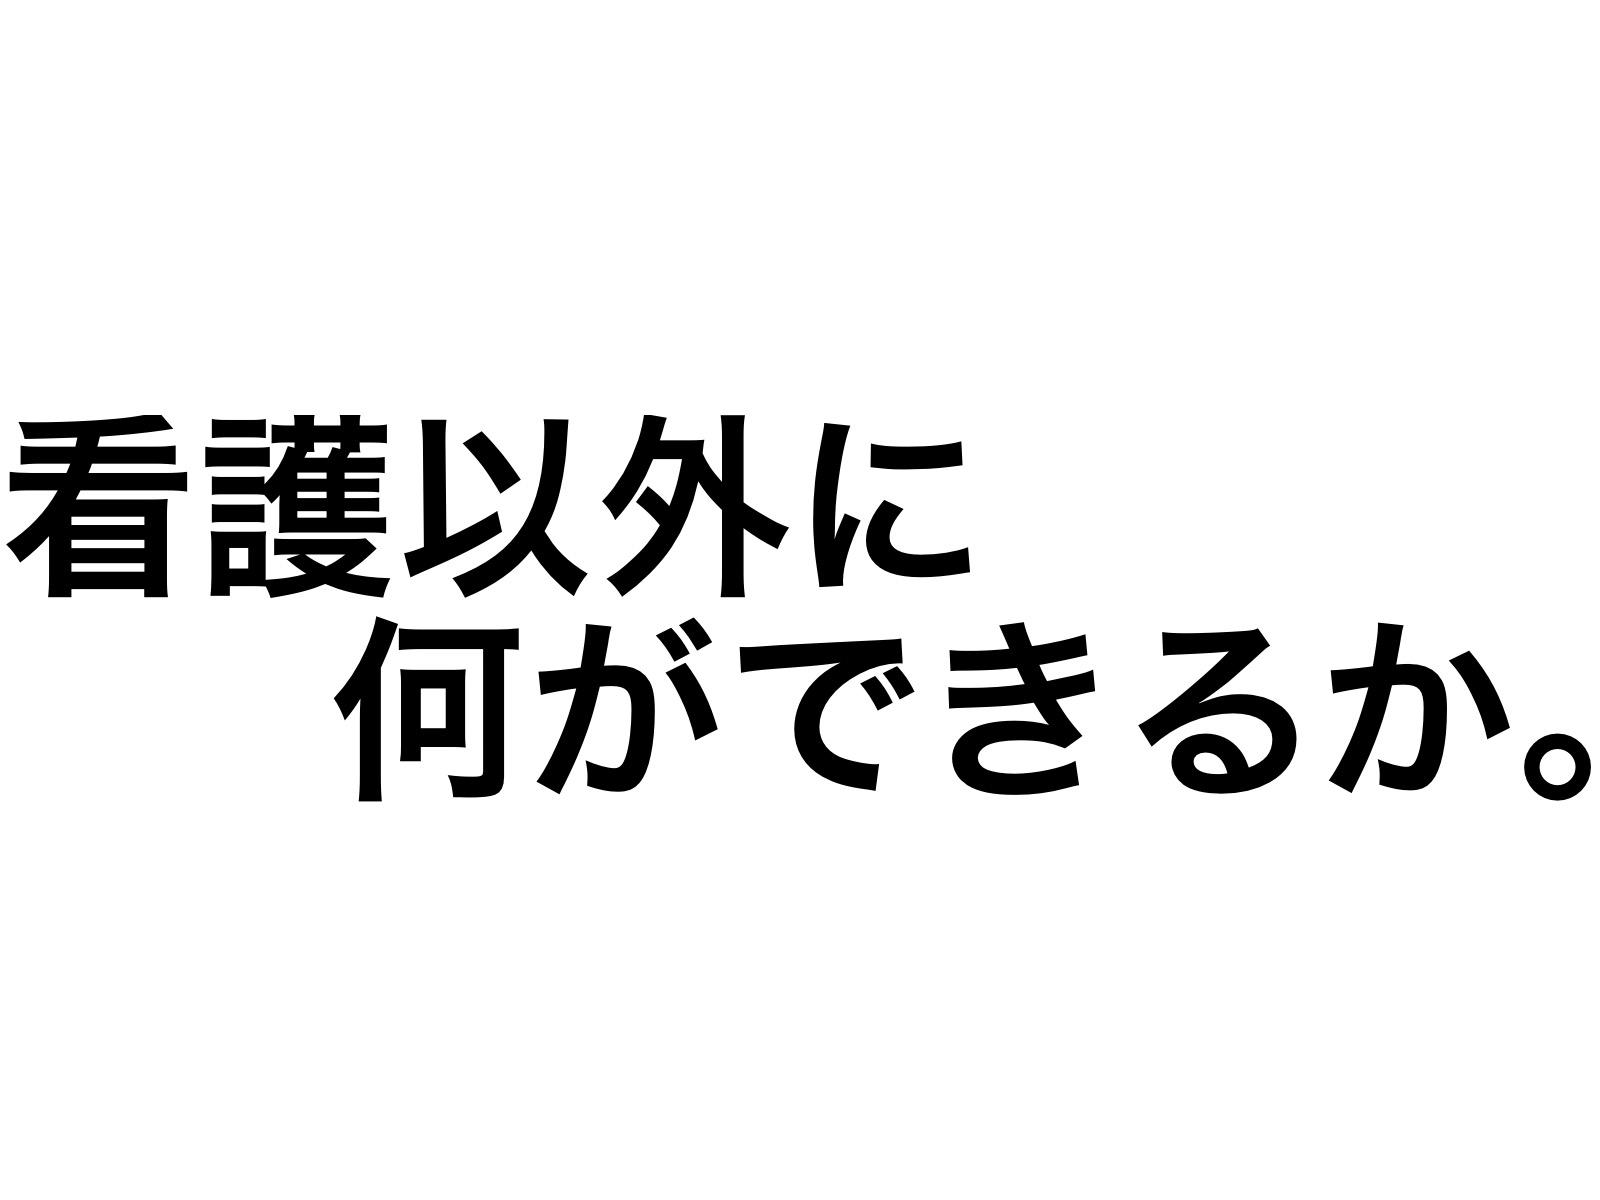 2016 08 24 22 00 40